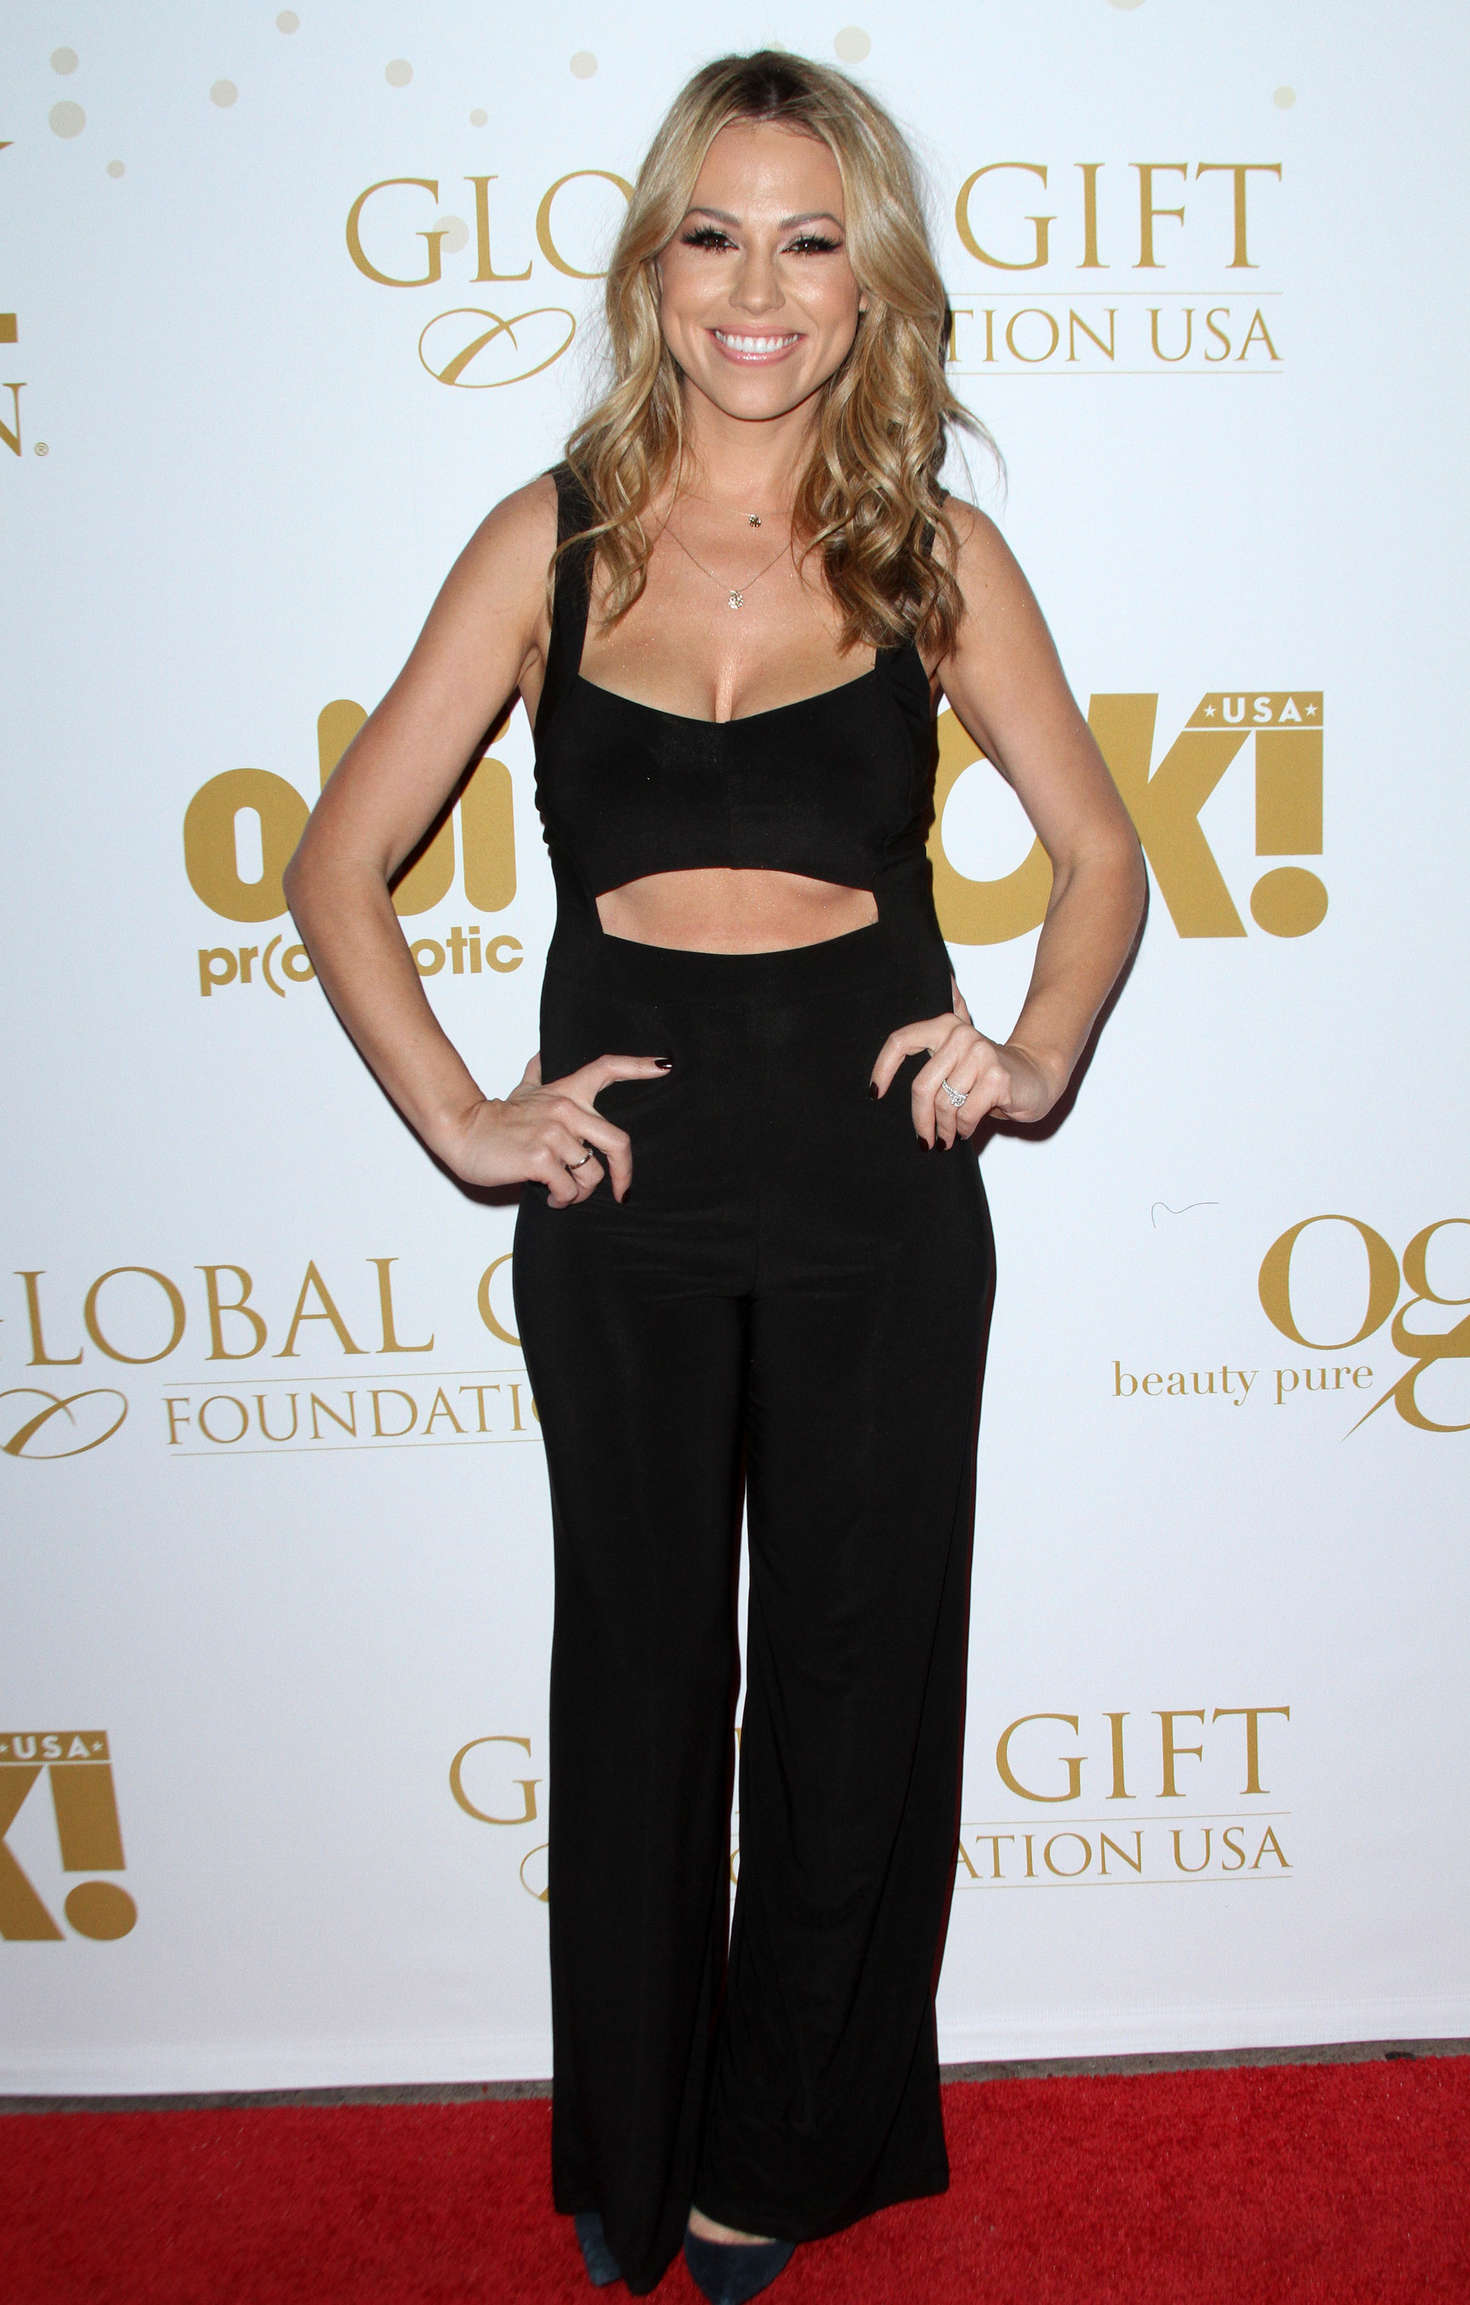 Jessica Hall OK! Magazines Pre-Oscar Party in Los Angeles